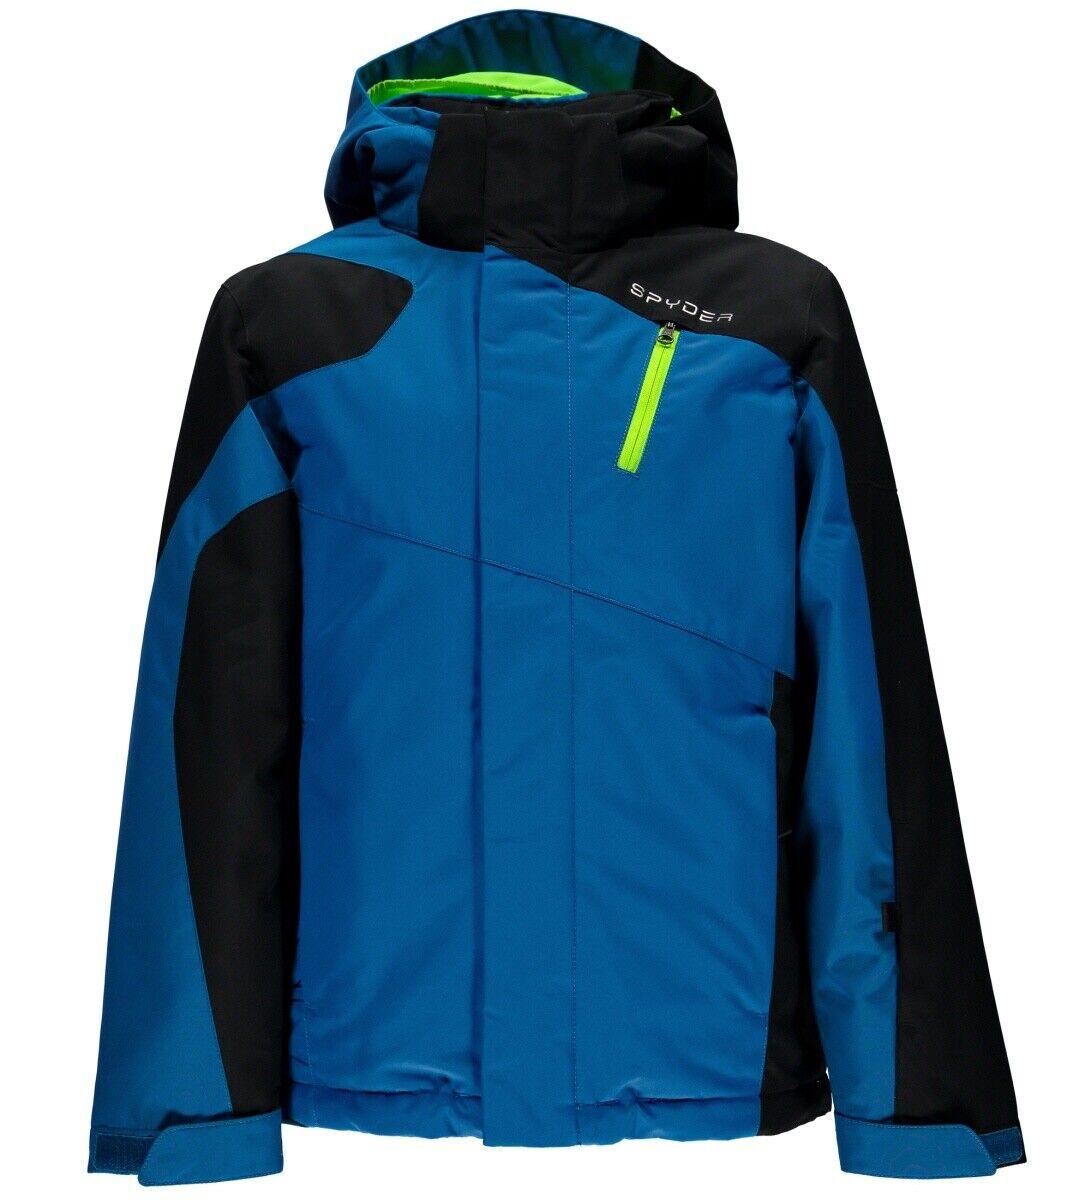 Spyder Boy's Guard Jacket Jungen Skijacke french Blau schwarz